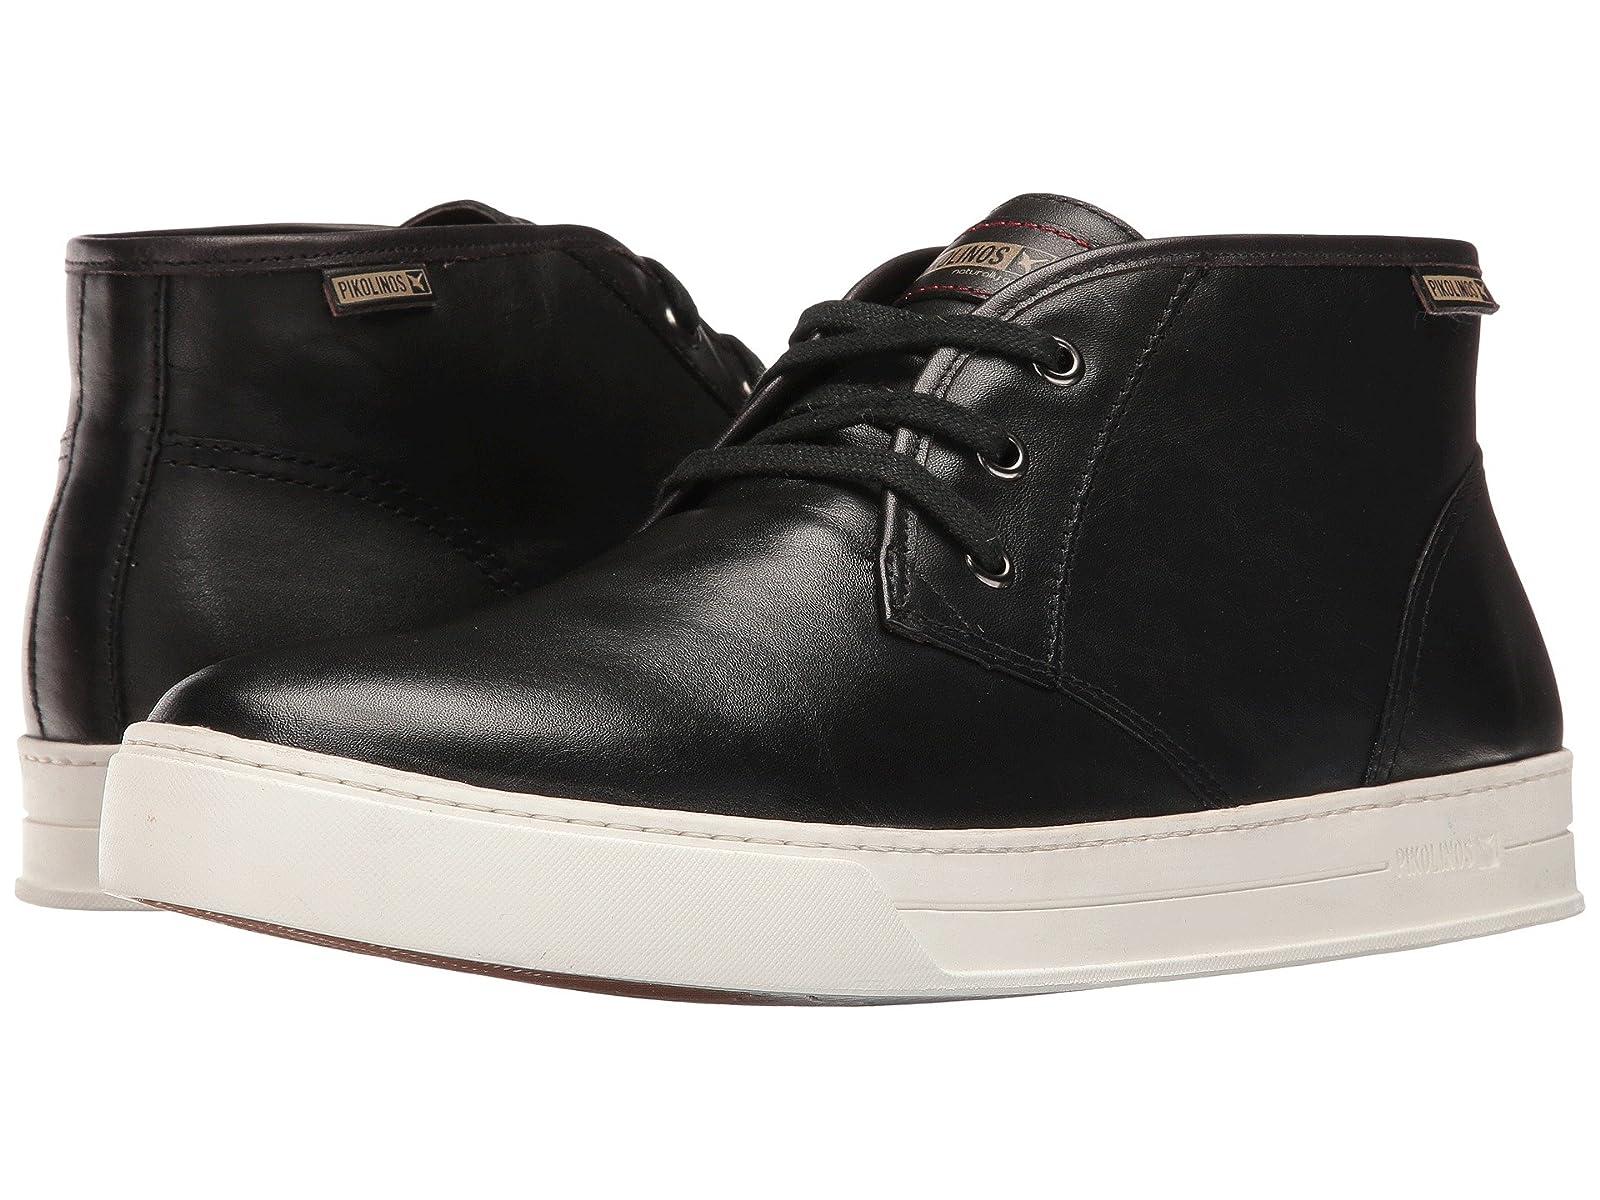 Pikolinos Mackenzie M0C-8028C1Cheap and distinctive eye-catching shoes